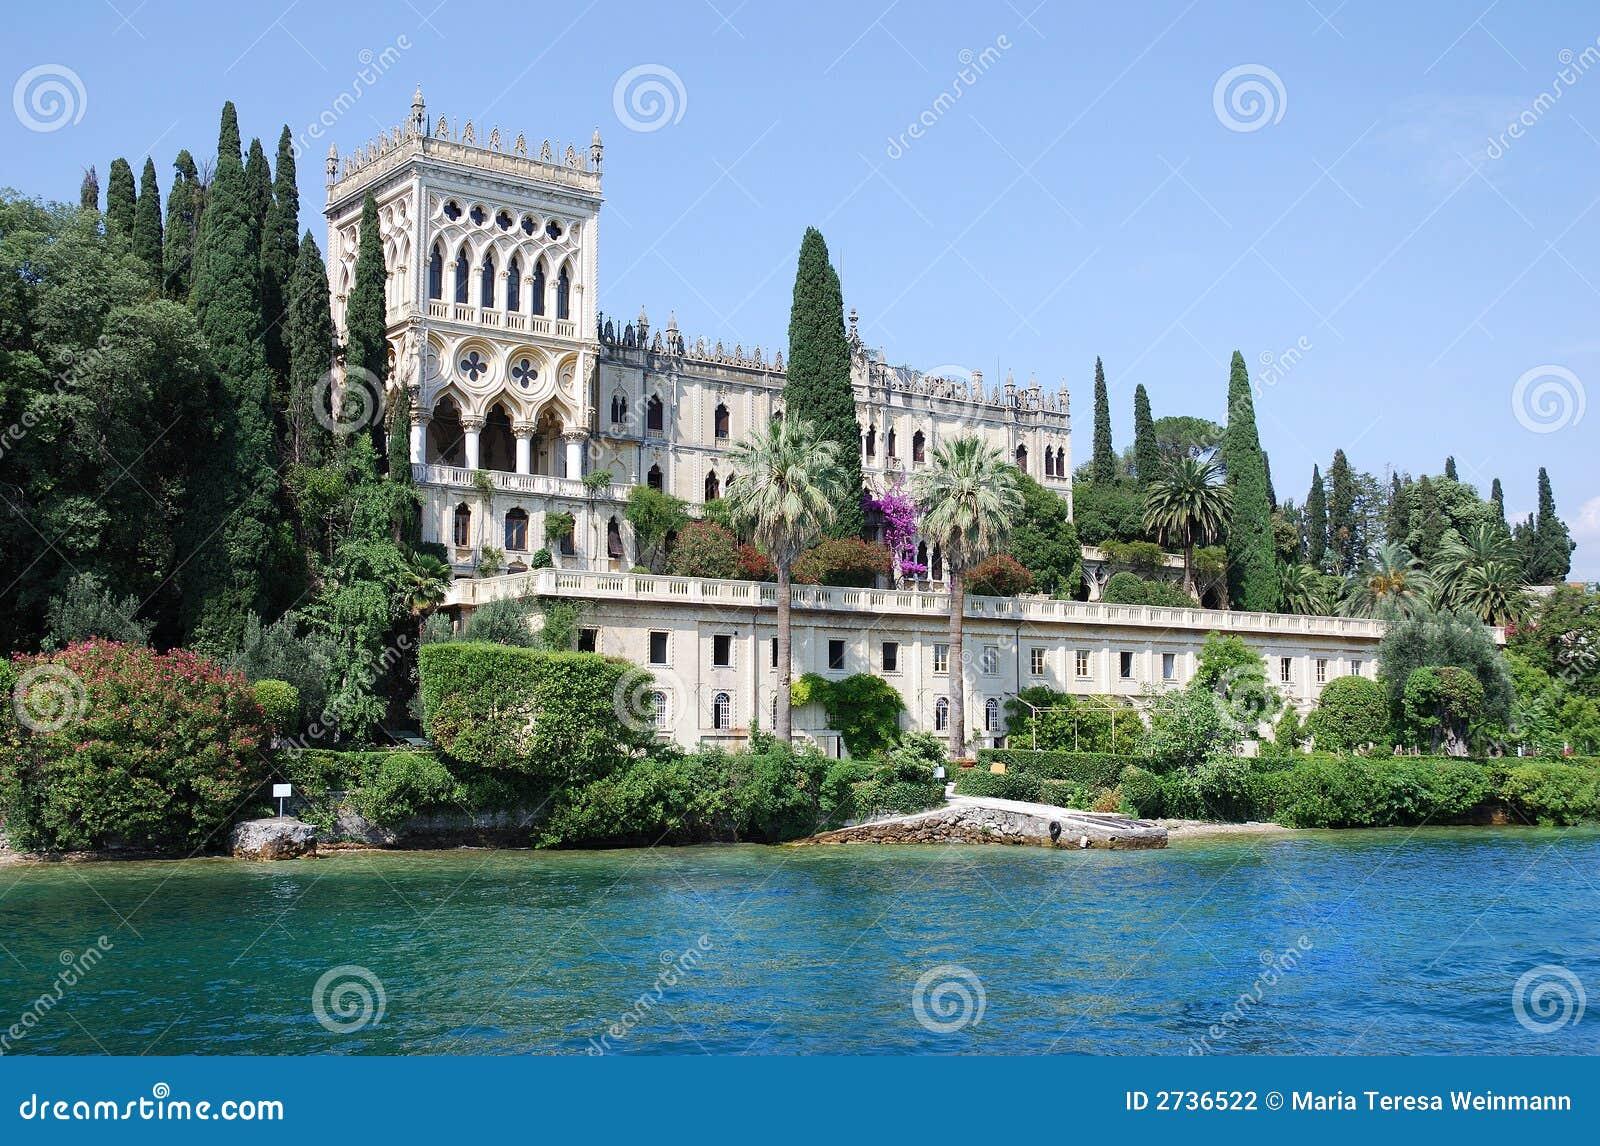 Isola di Garda (Italien) - Palast